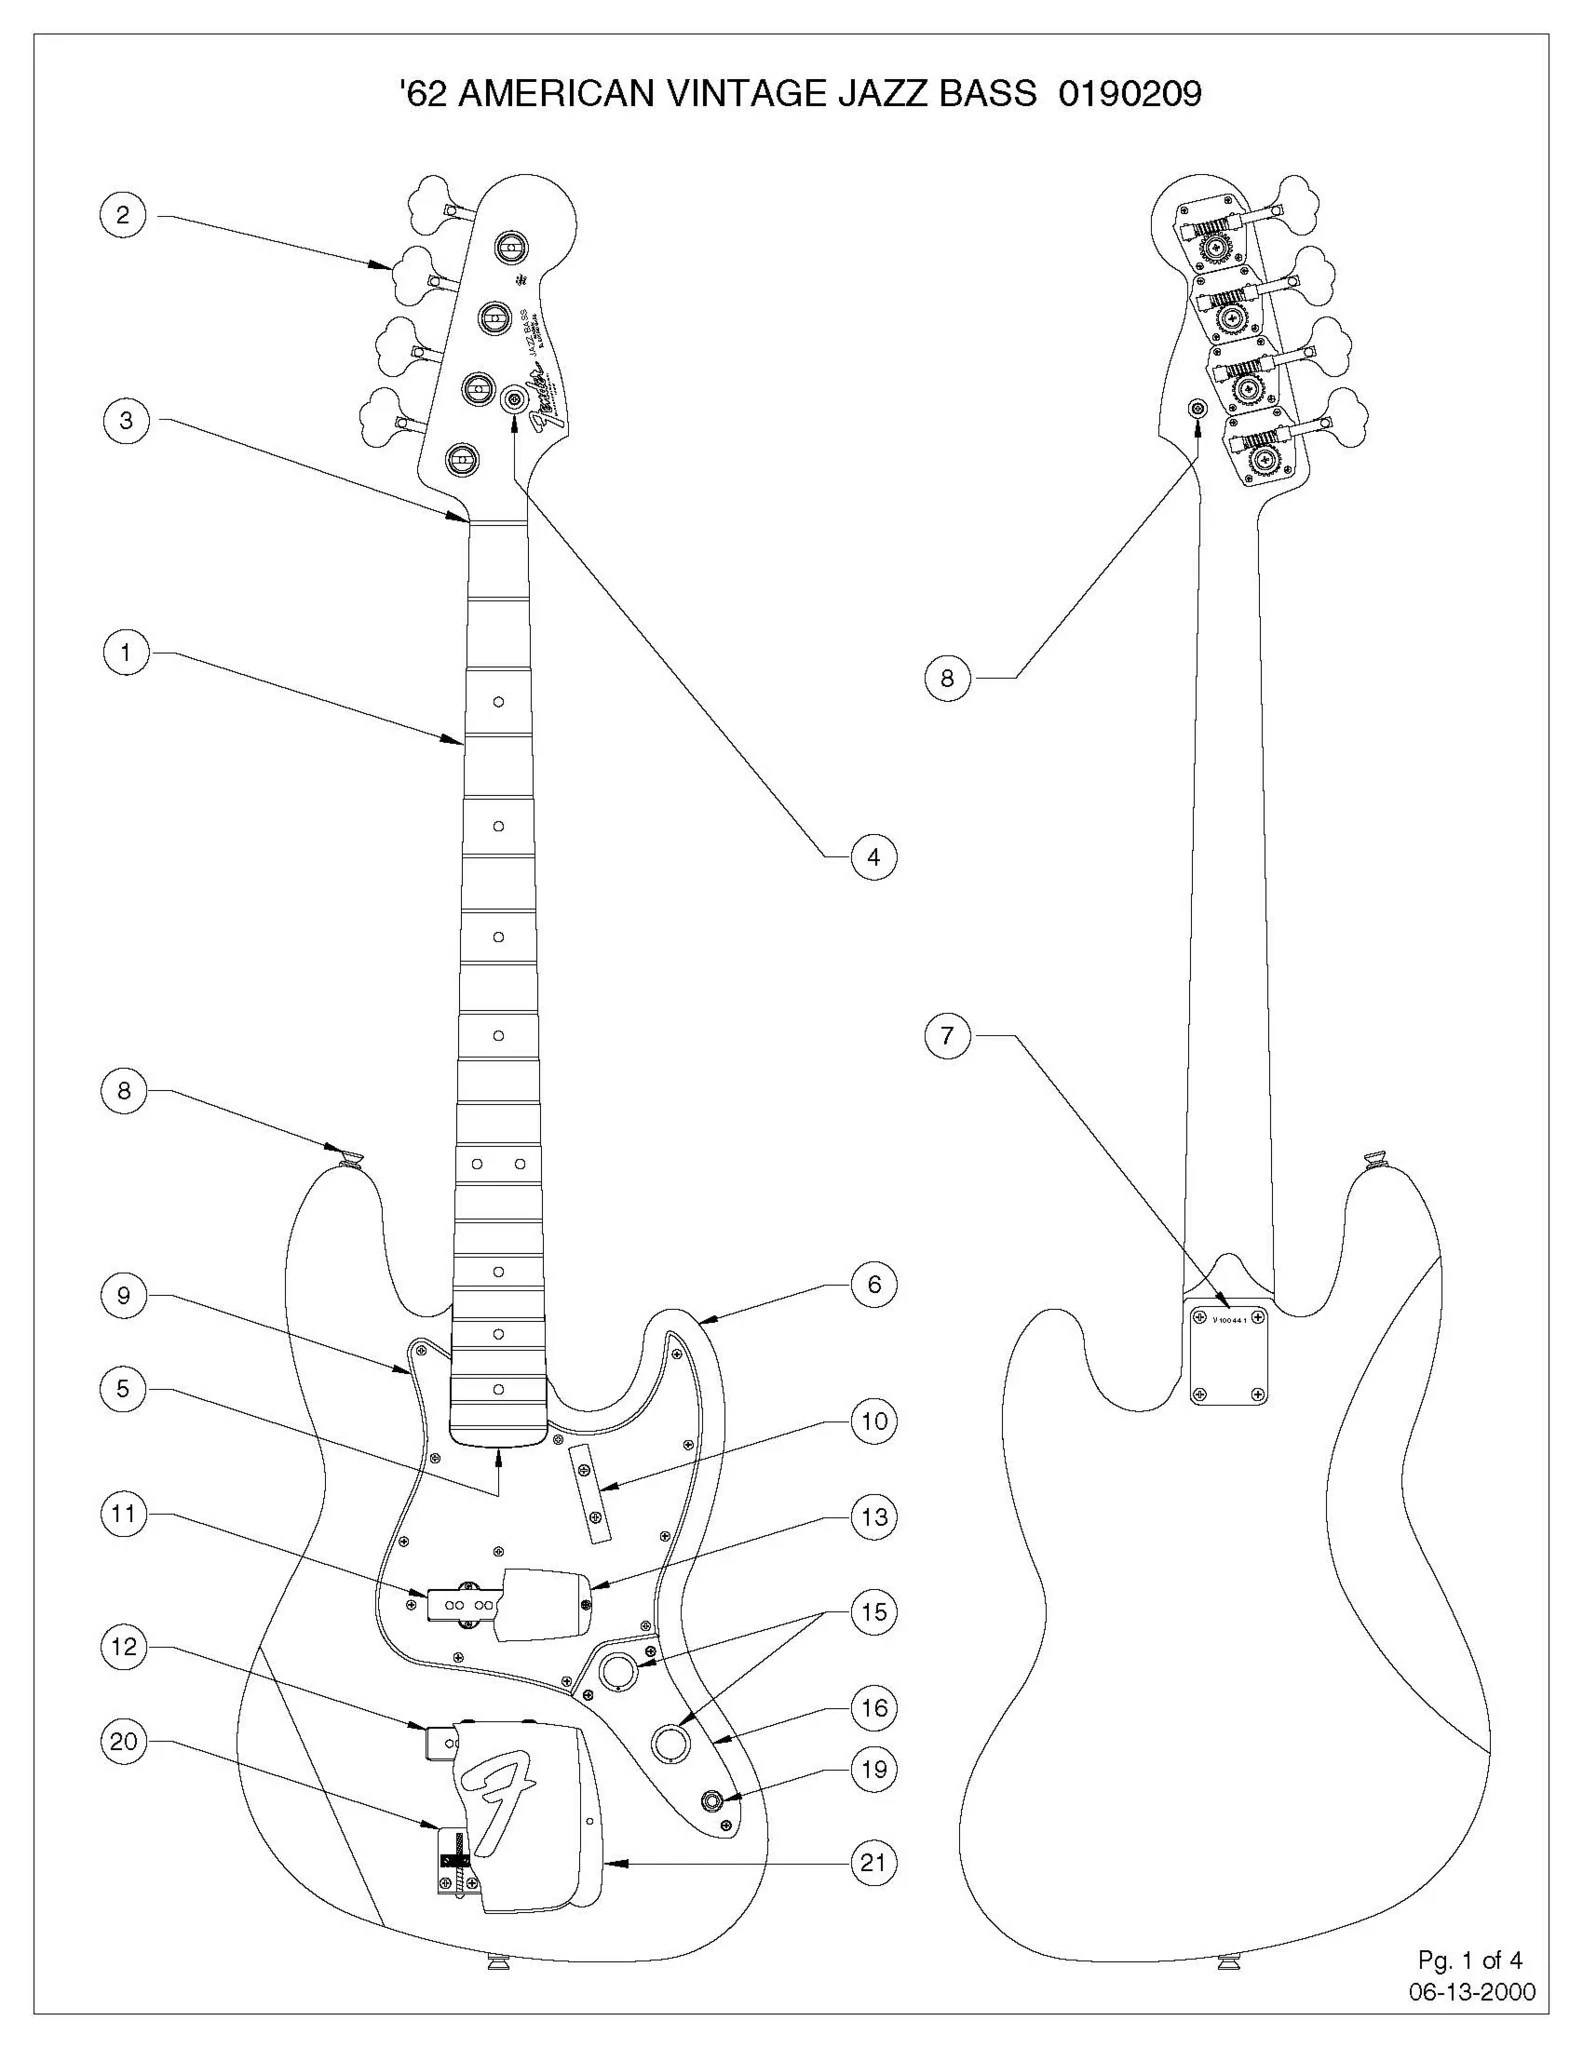 small resolution of 62 jazz bass wiring diagram diagrams jazz bass concentric u2013 sigler music design